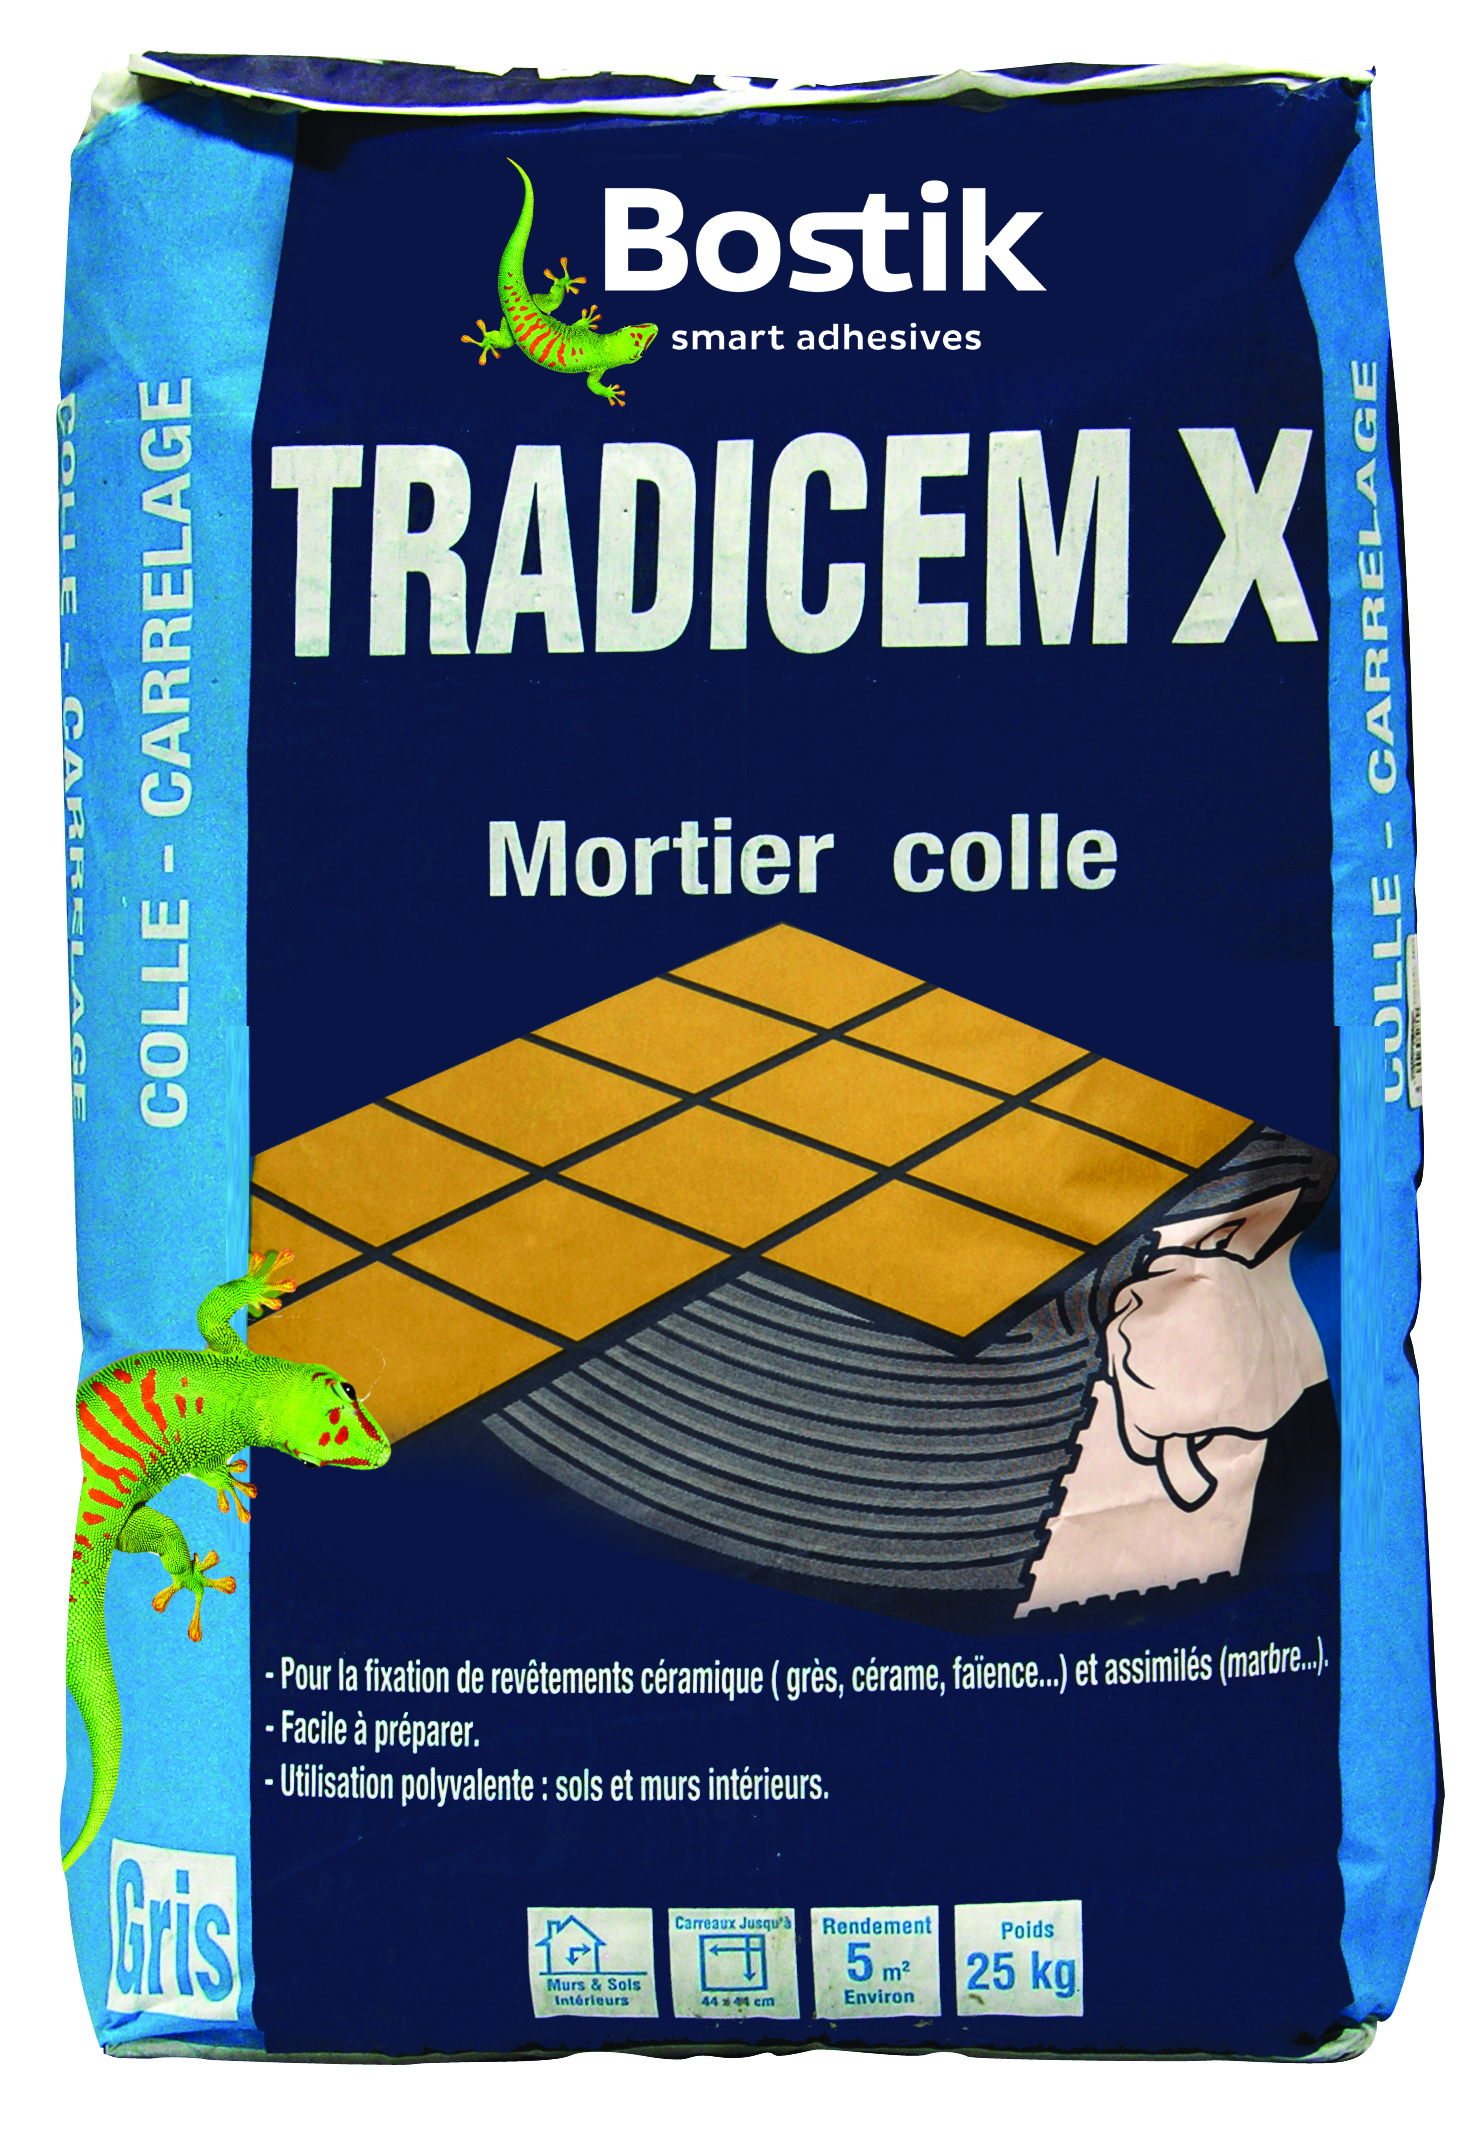 Ciment tradicem x-